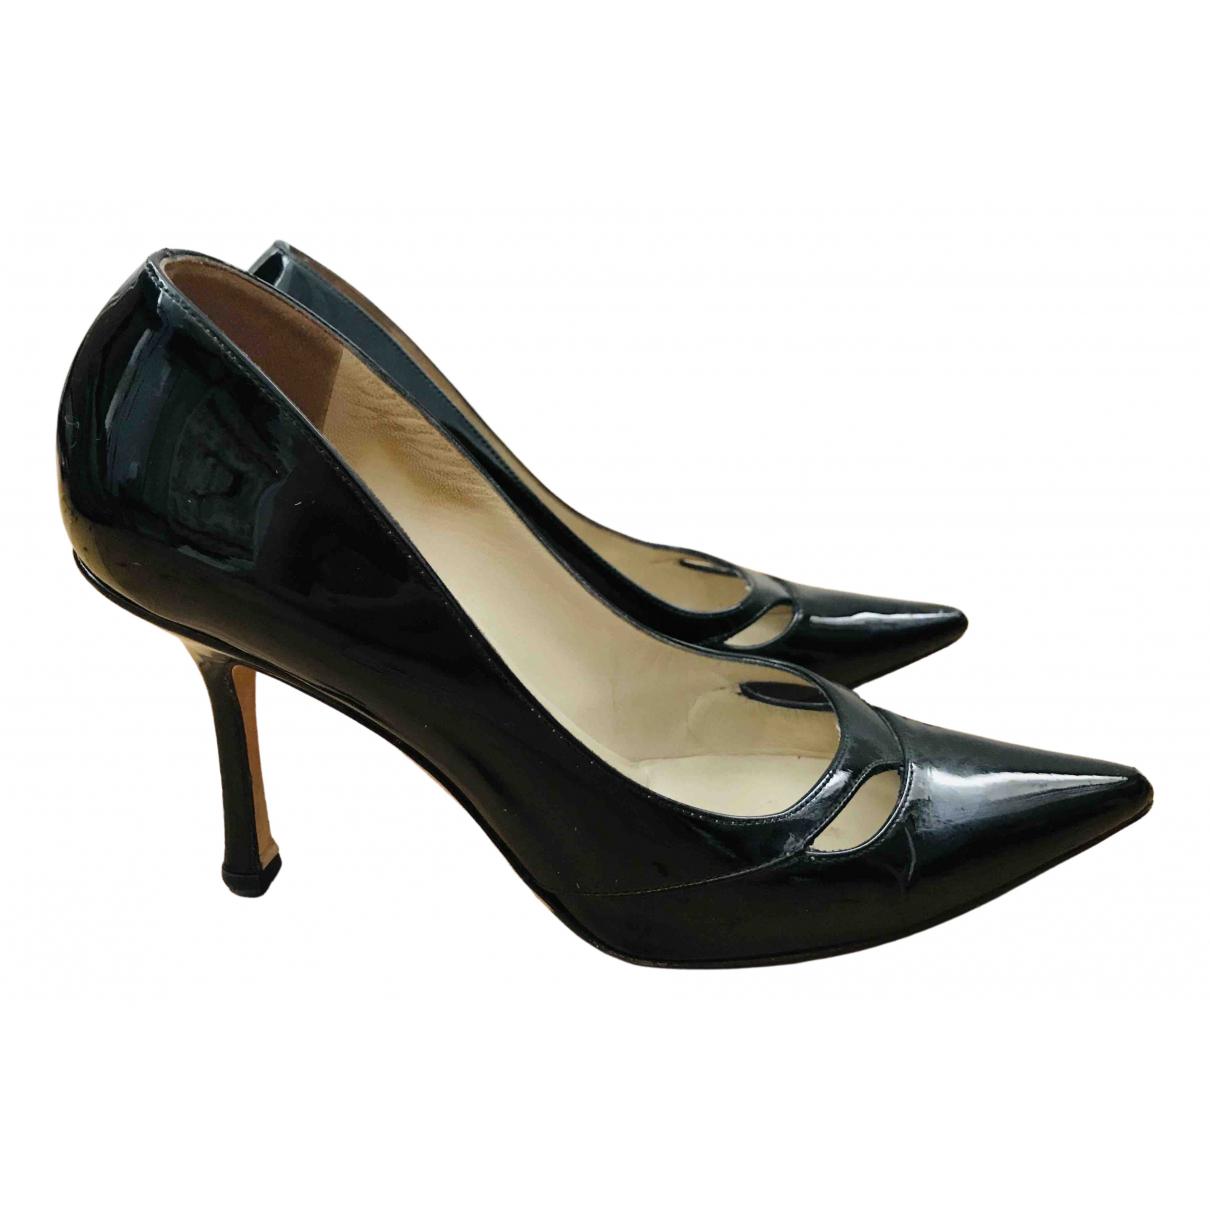 Jimmy Choo \N Black Patent leather Heels for Women 37 EU